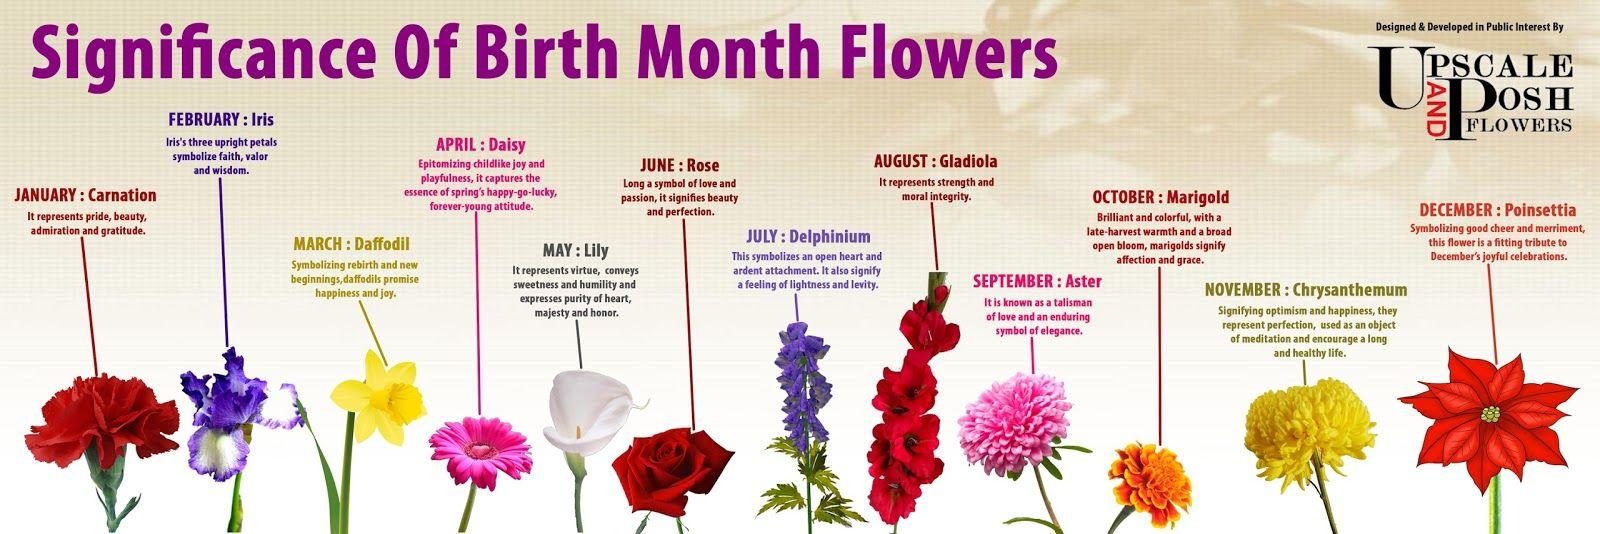 Birth flower Month flowers, February birth flowers